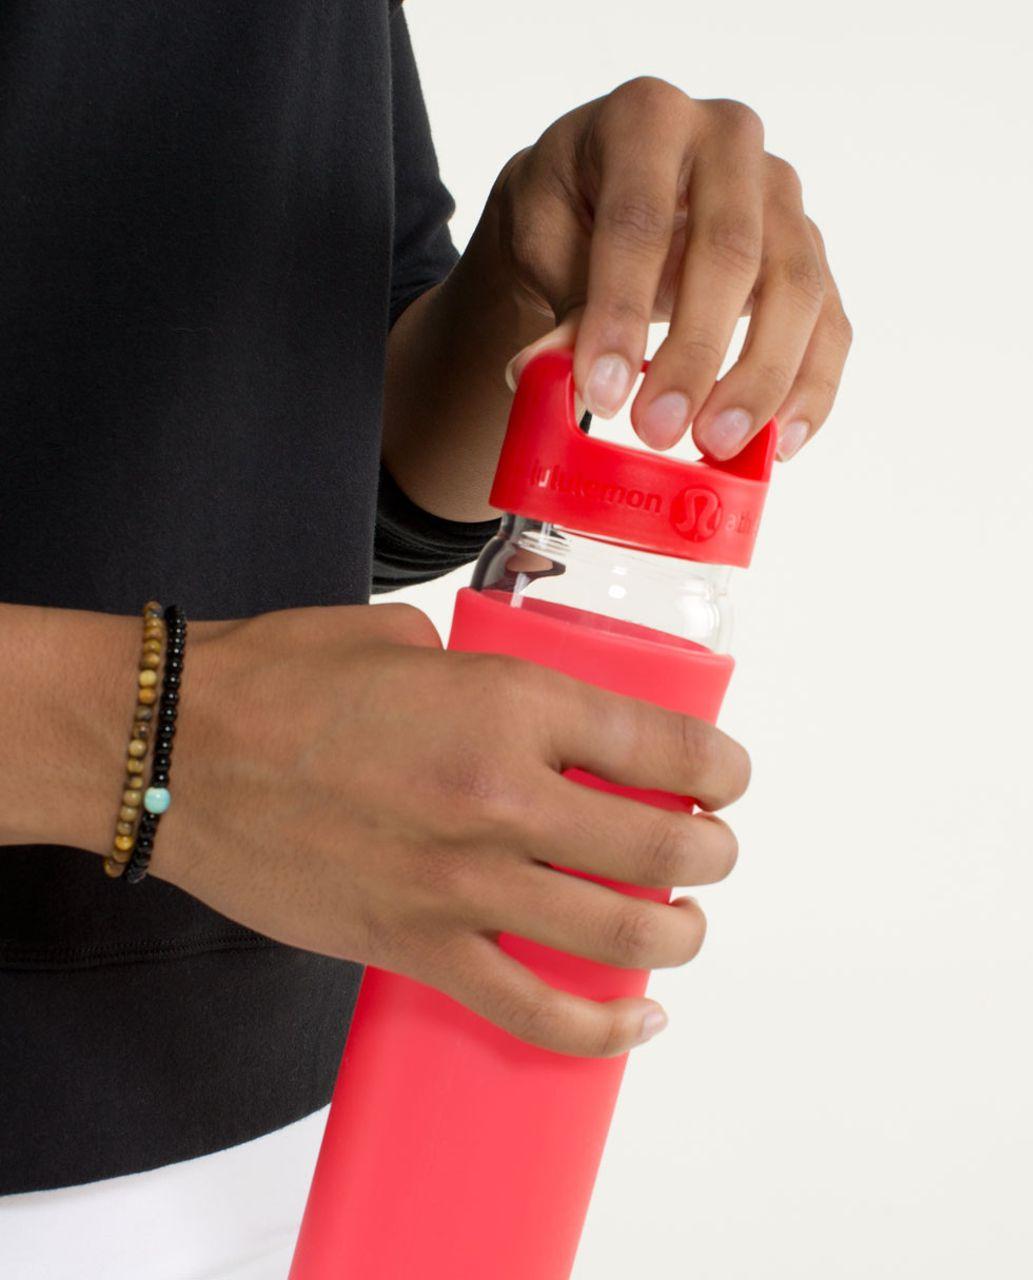 Lululemon Pure Balance Water Bottle - Love Red